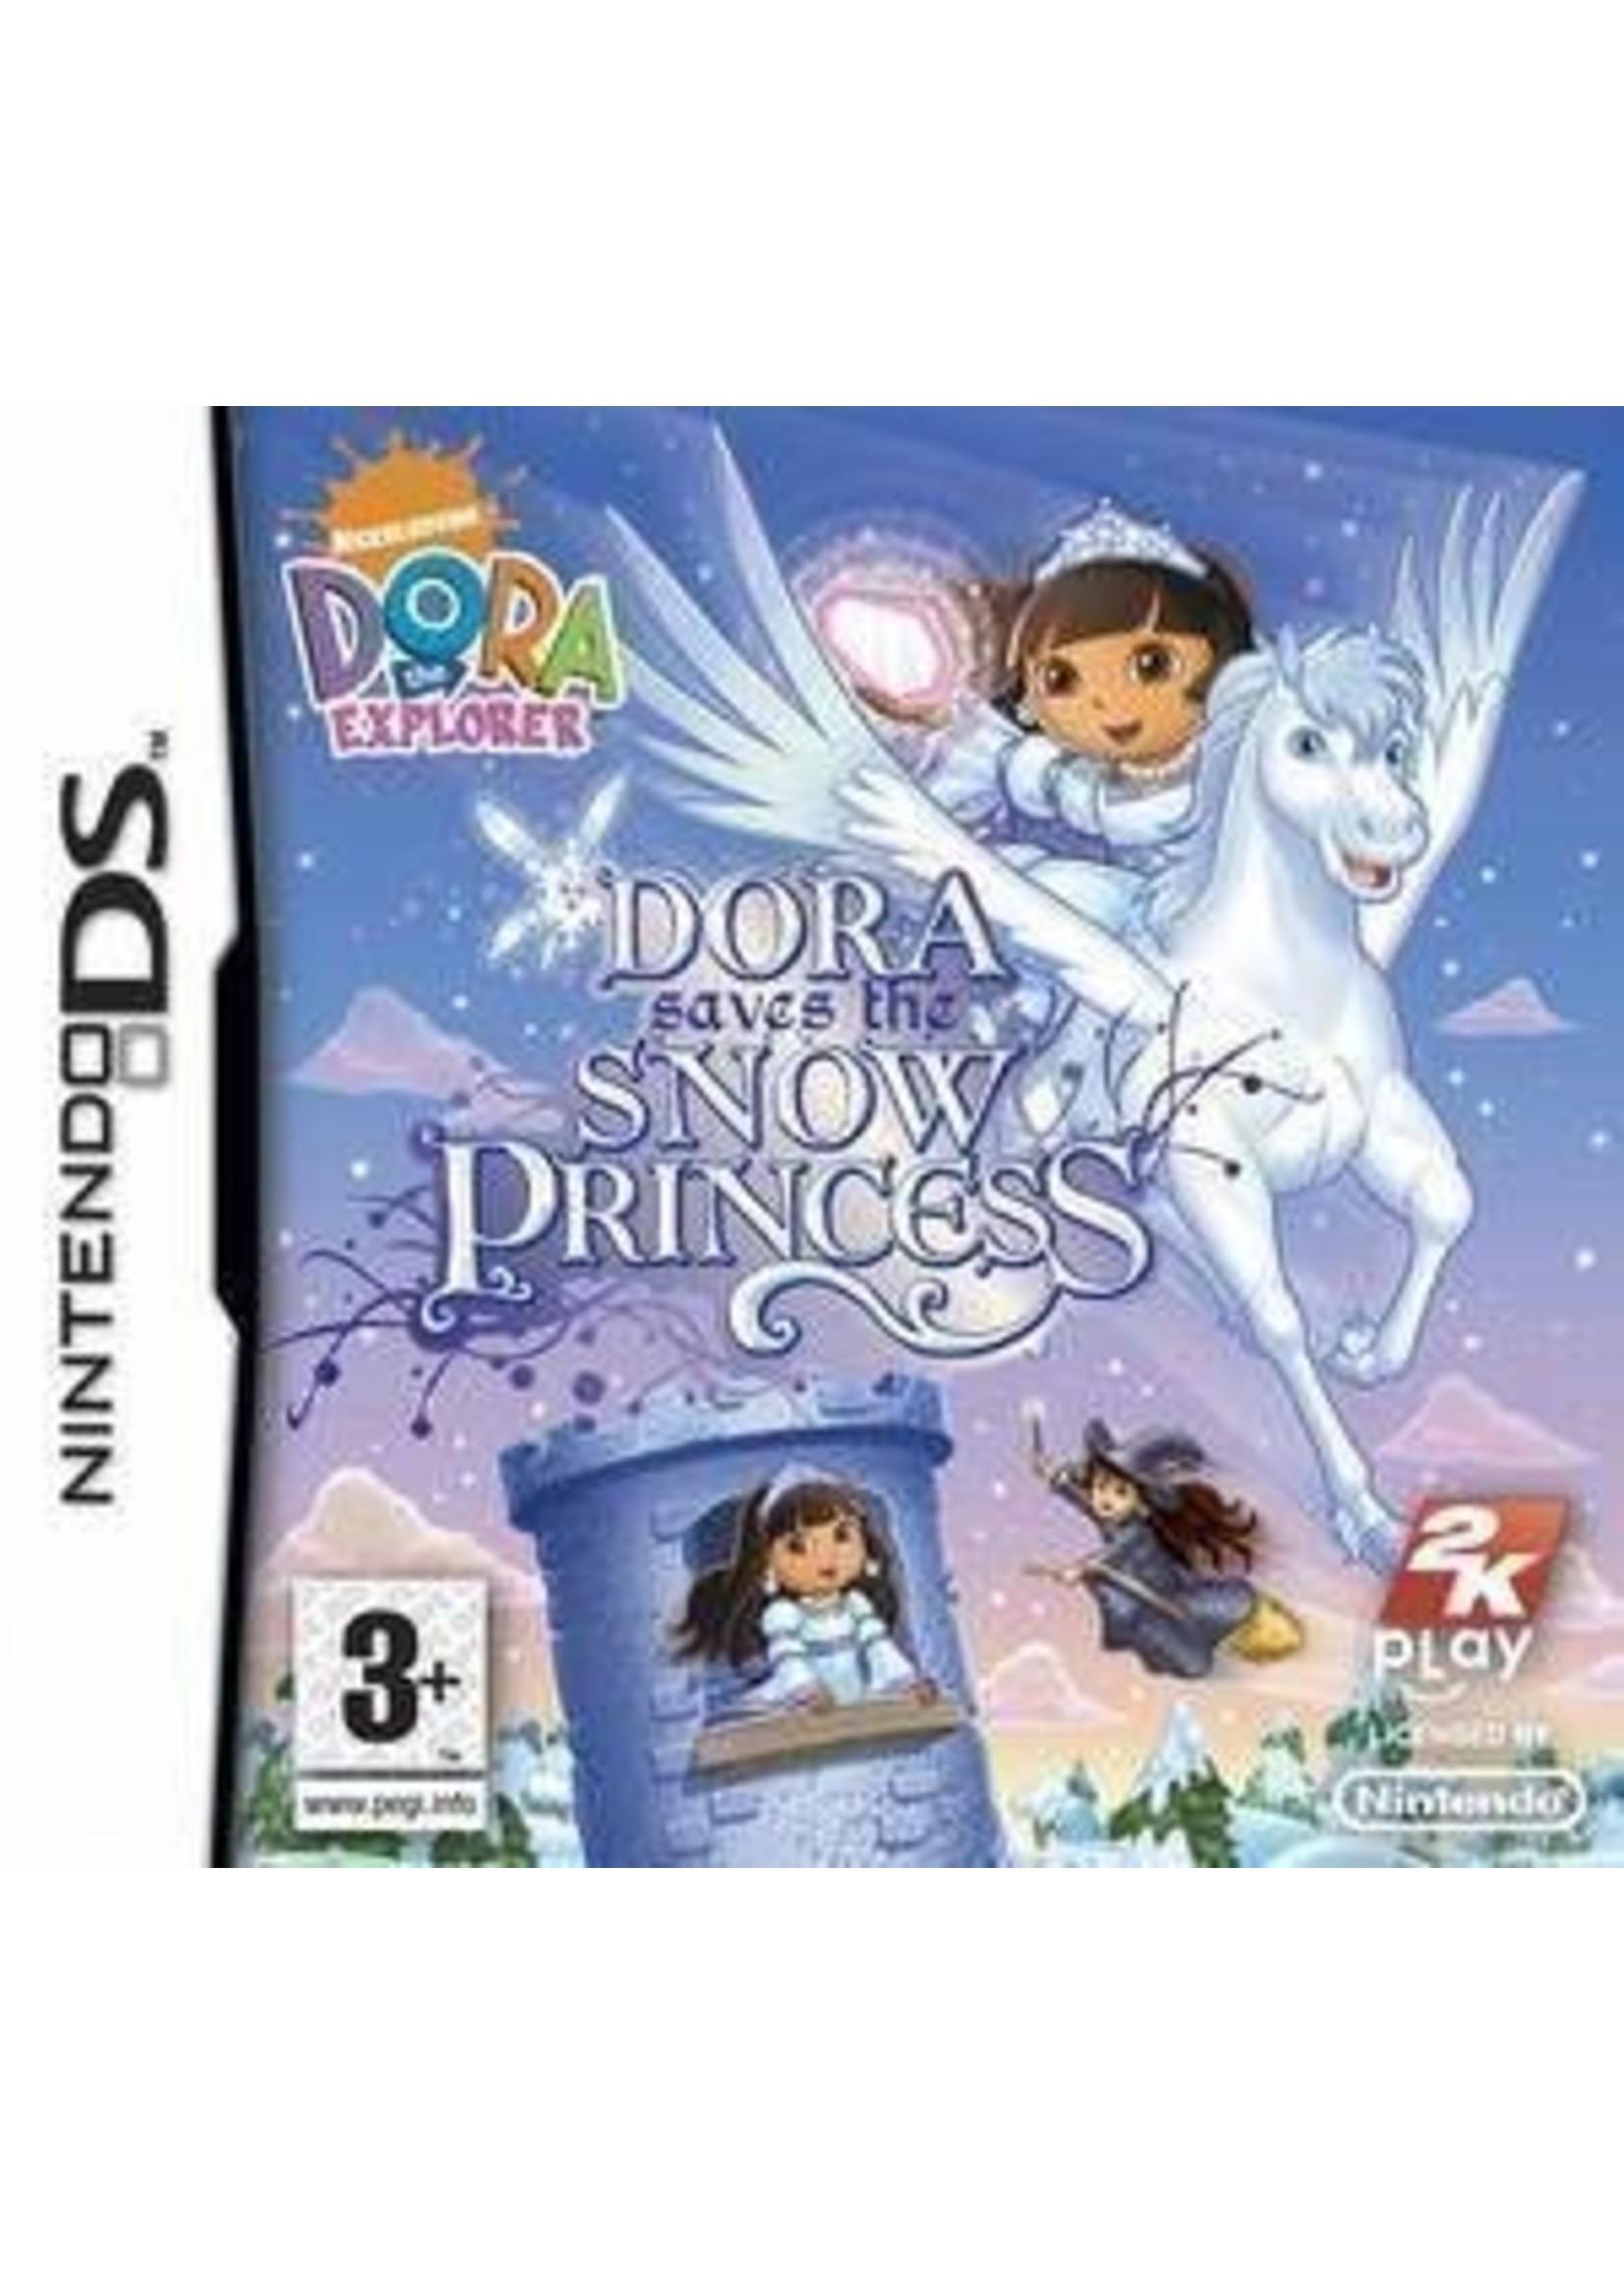 Dora Saves the Snow Princess - NDS PrePlayed